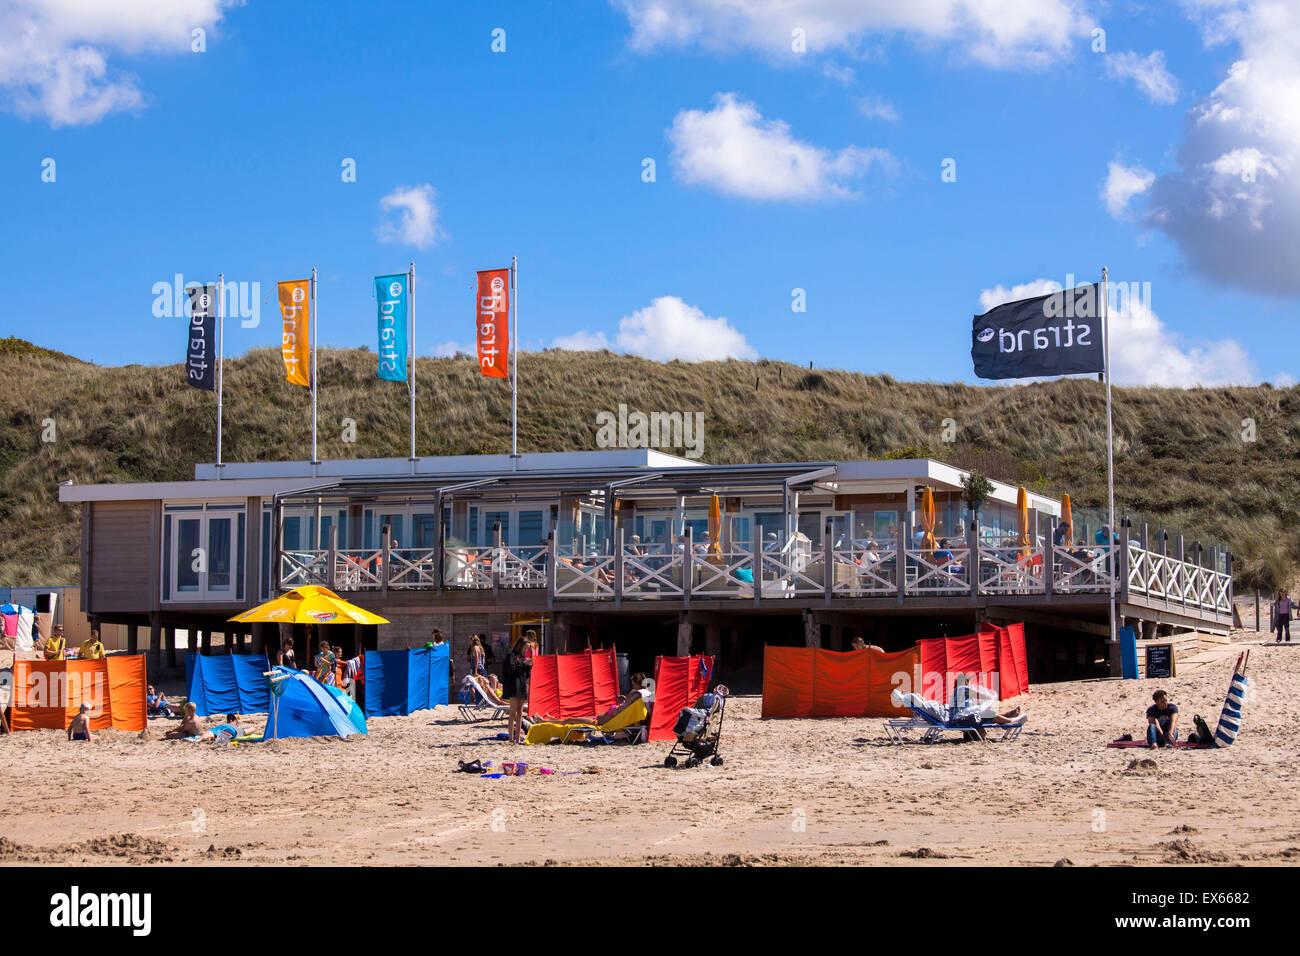 Europe, Netherlands, Zeeland, restaurant pavillon Strand90 at the beach in Domburg on the peninsula Walcheren. Stock Photo